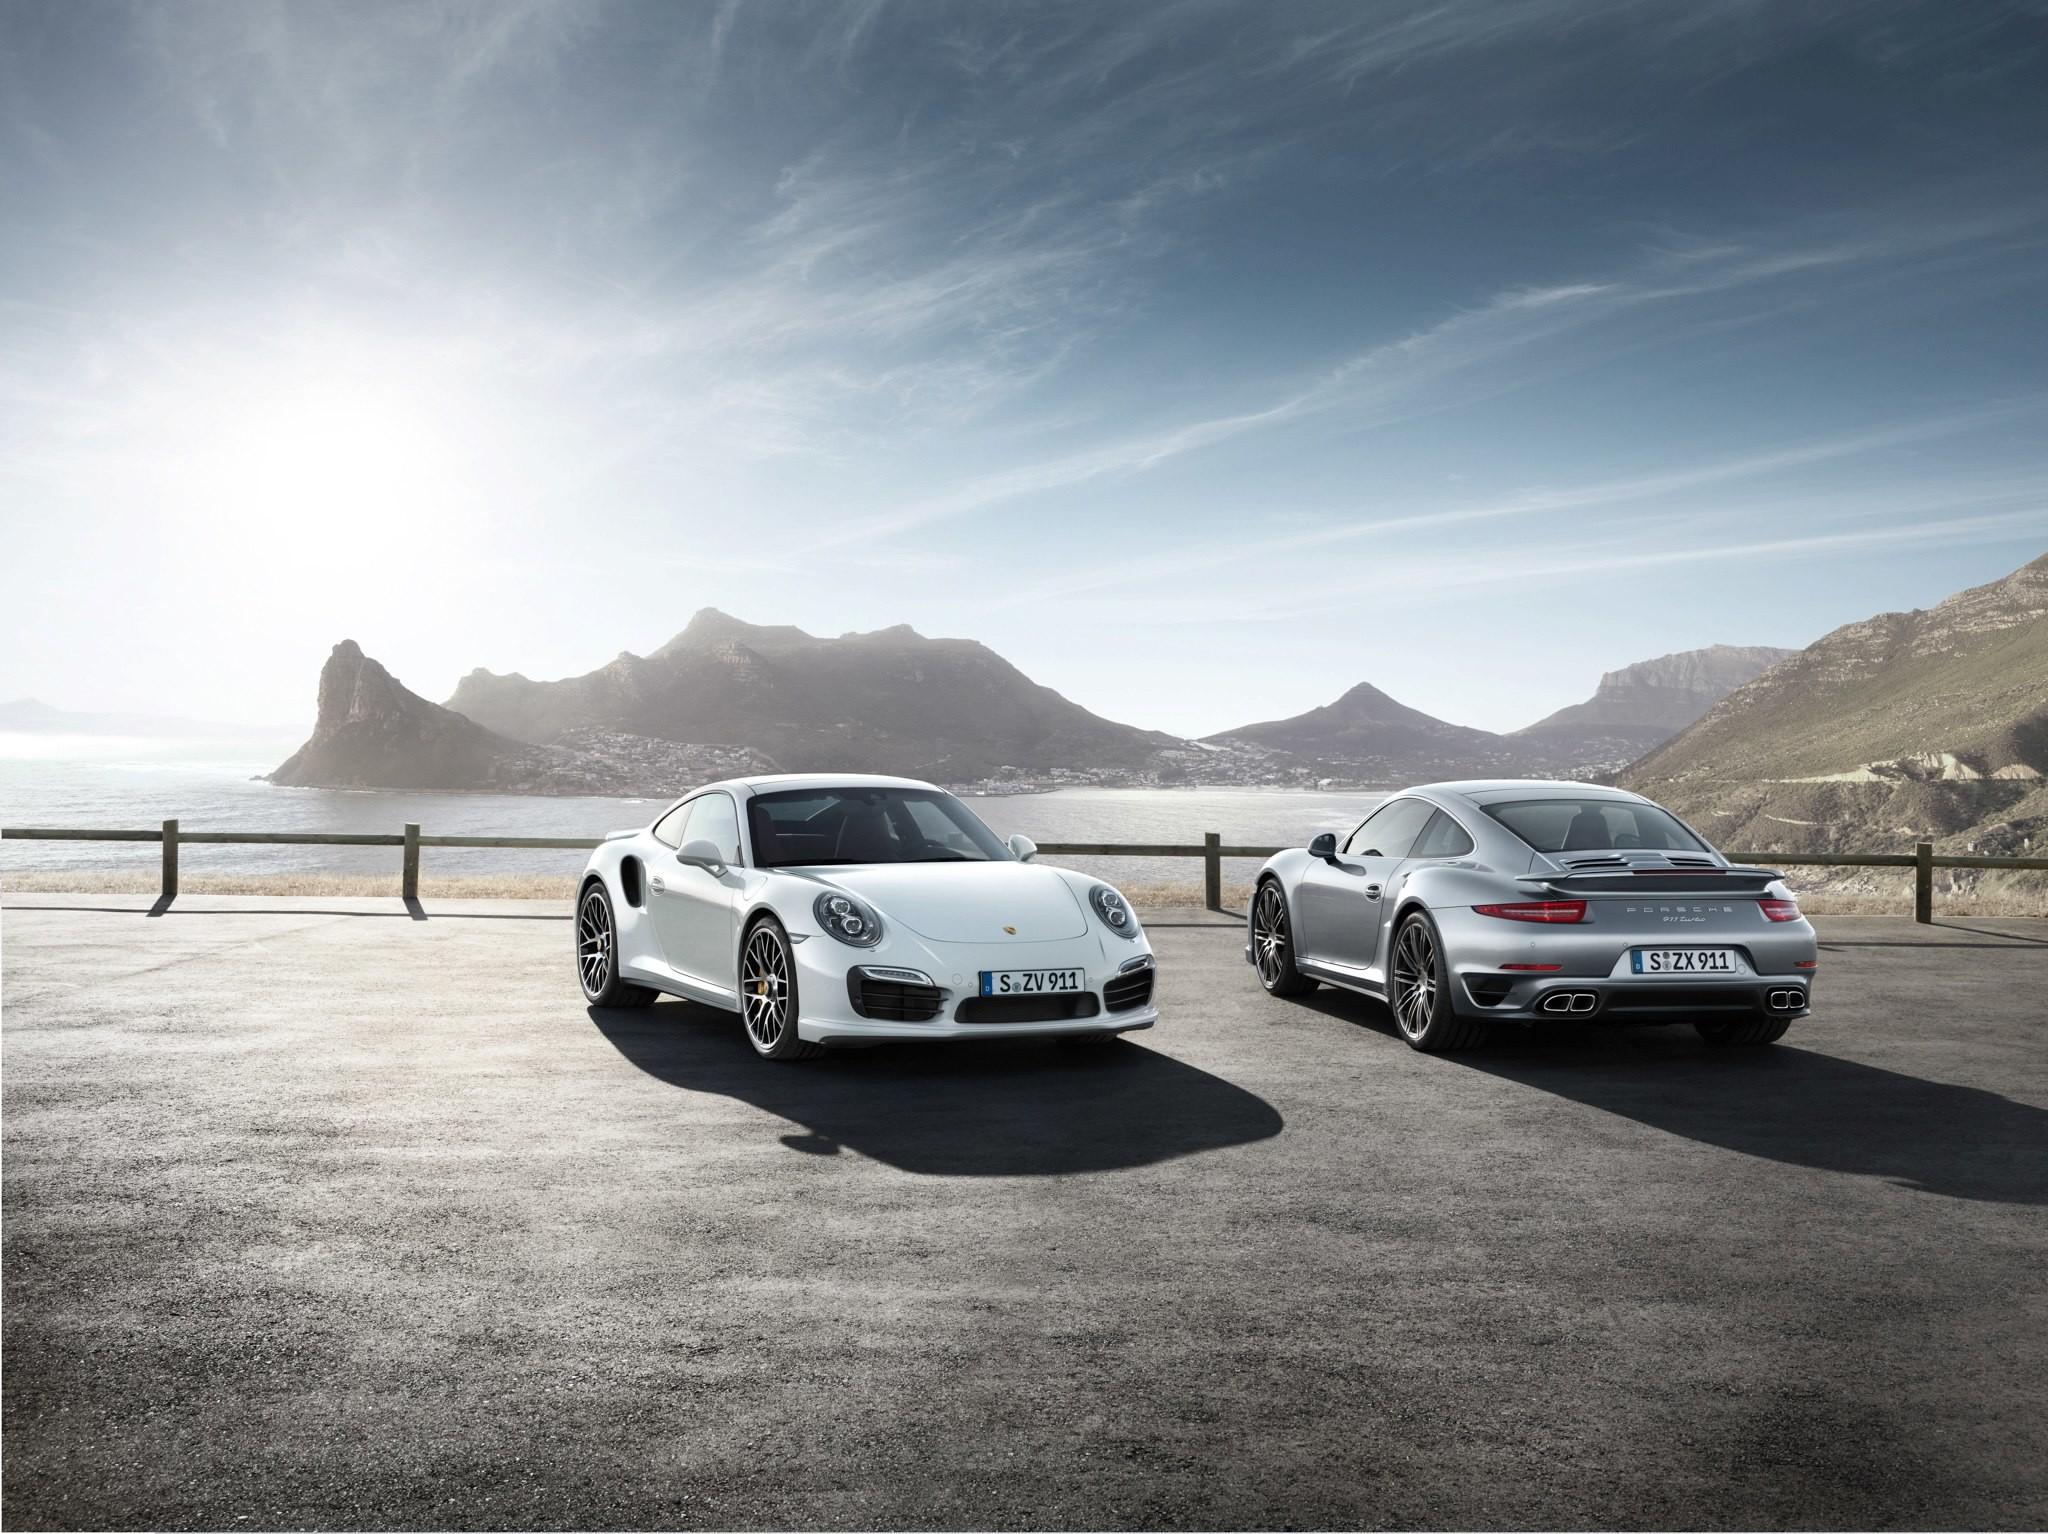 2560x1600 2017 Porsche 911 GTS Targa 4 GTS